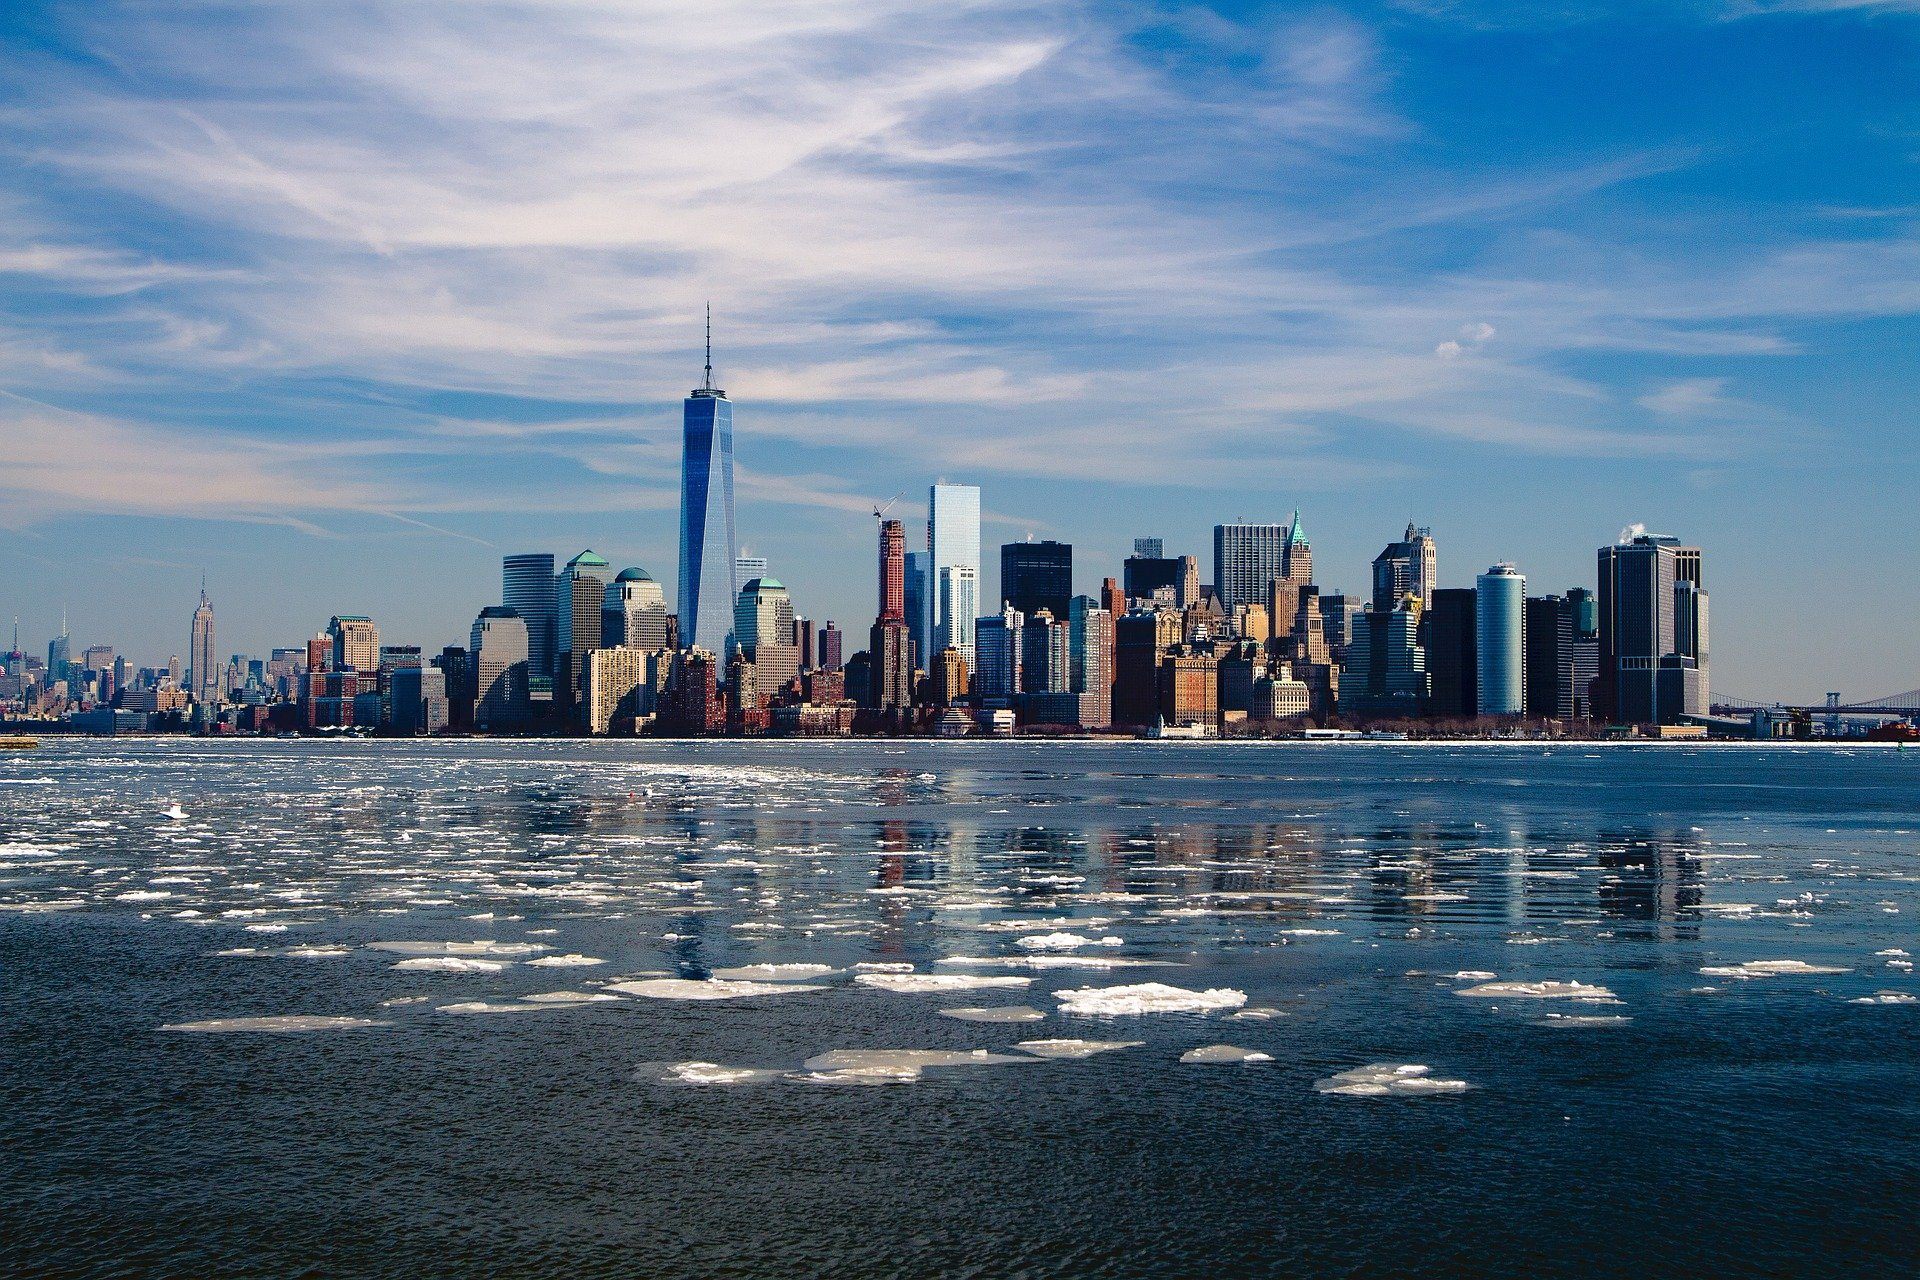 Main image of article: New York City